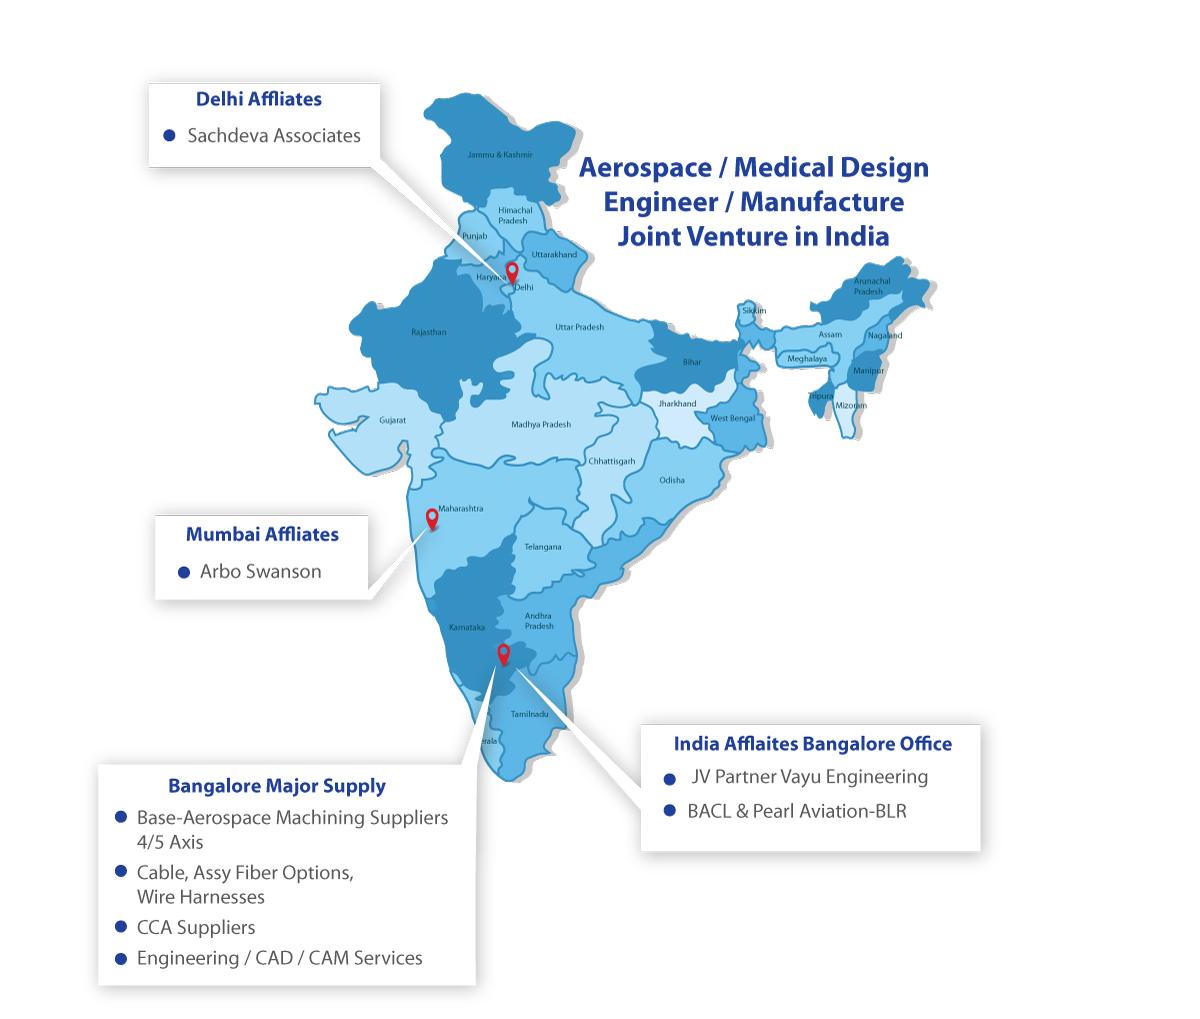 Bacl Bangalore Aerospace Consultants Pvt Ltd Wiring Harness Manufacturers Delhi Lccsgi Affiliates In India Major Centers Medical